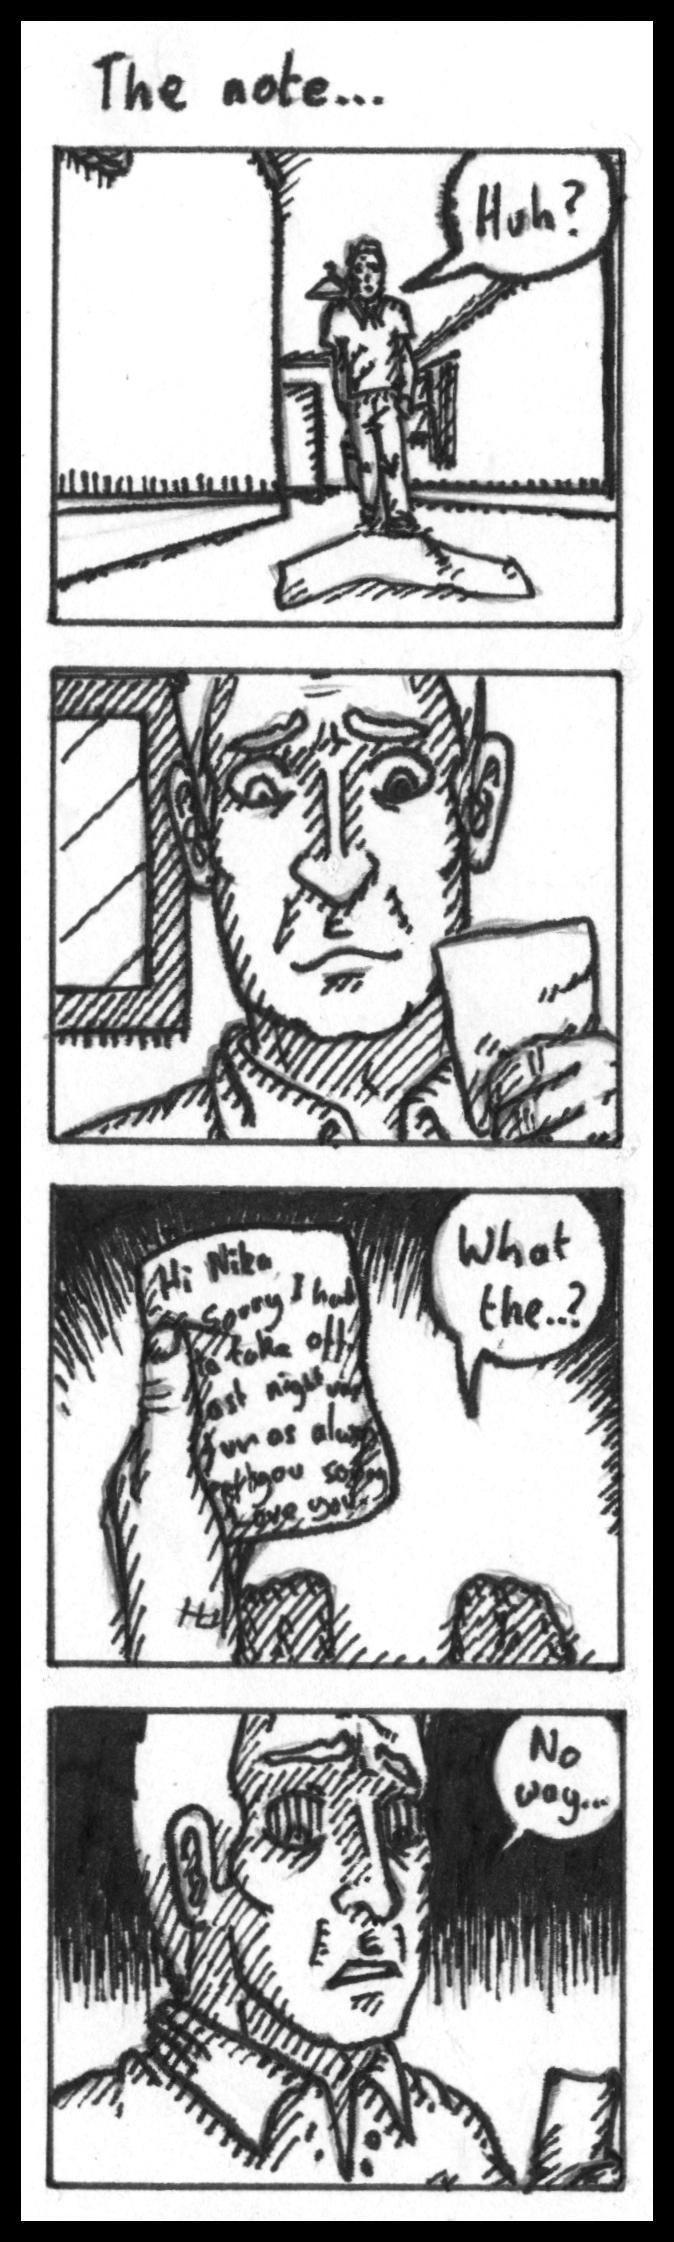 The note... by Tallisman-Rogue